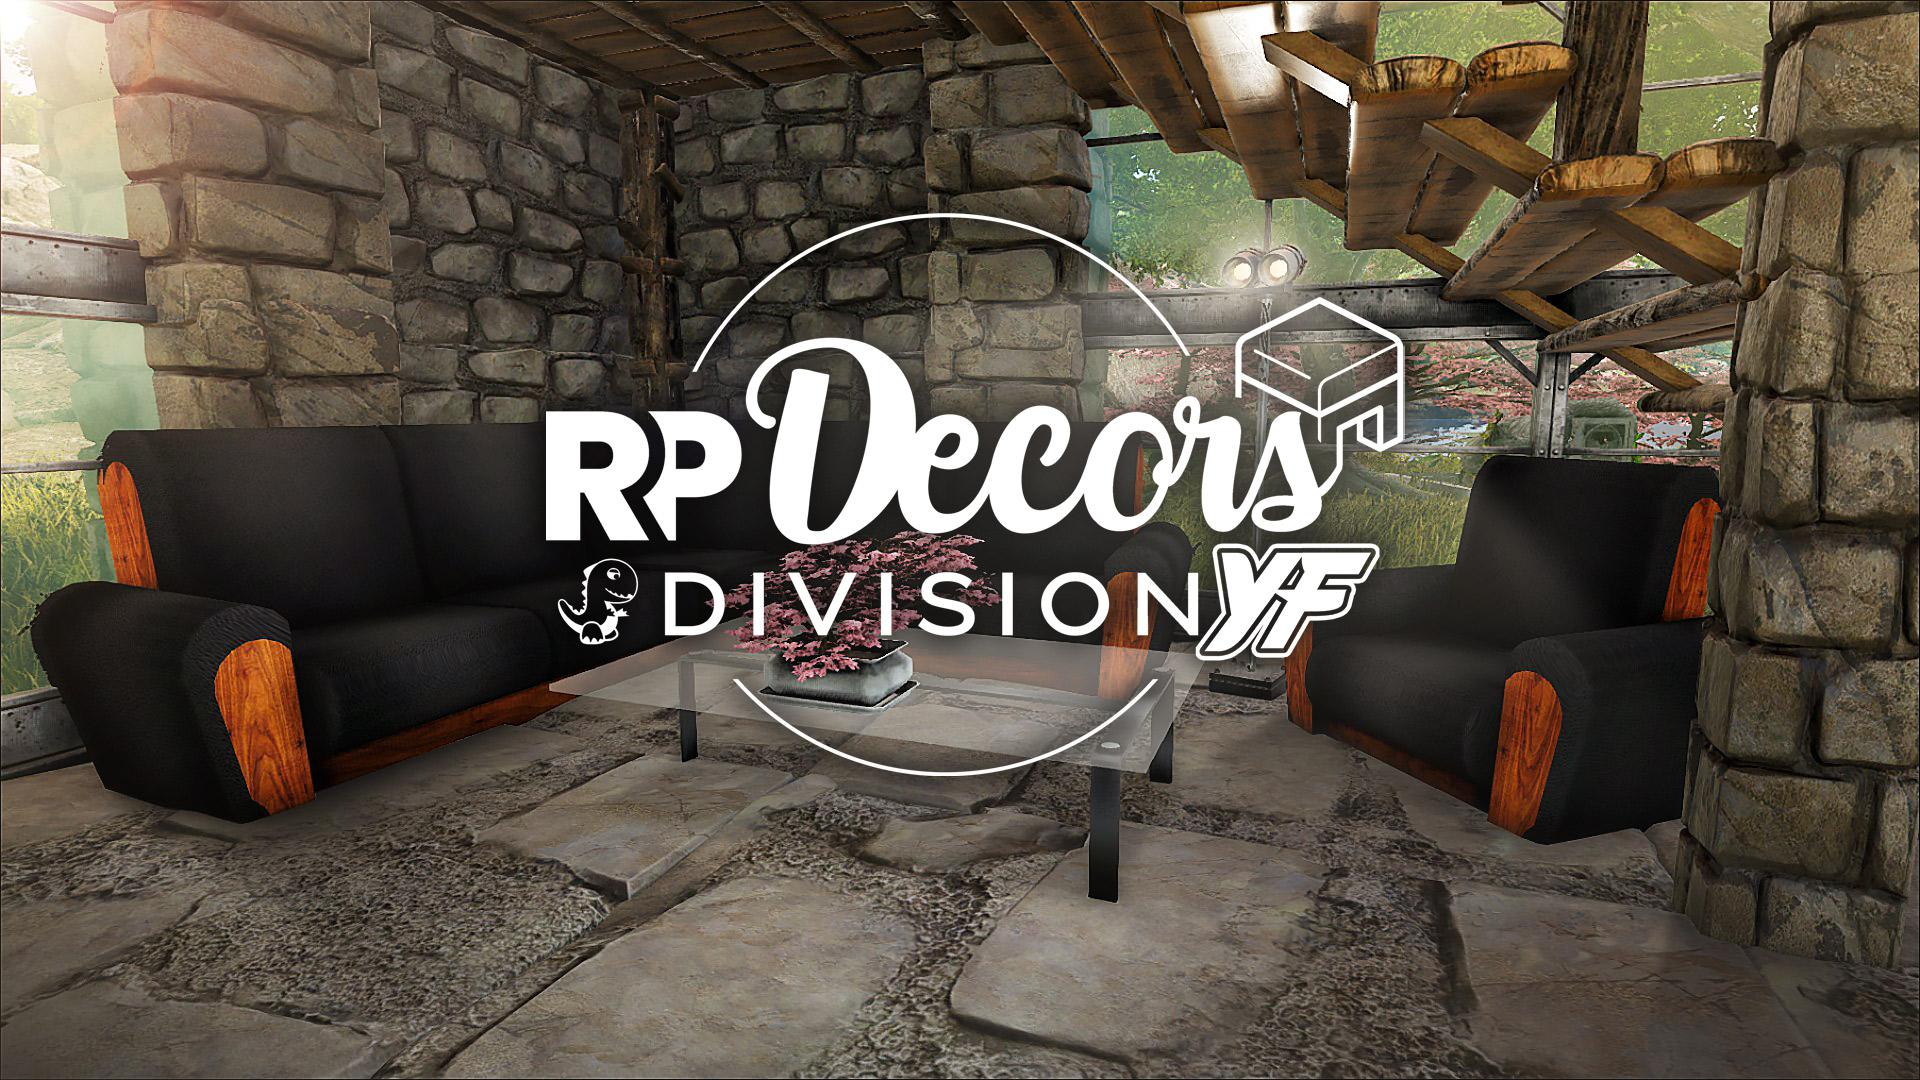 Pochette-Logo-Mod-RP-Decor-Division